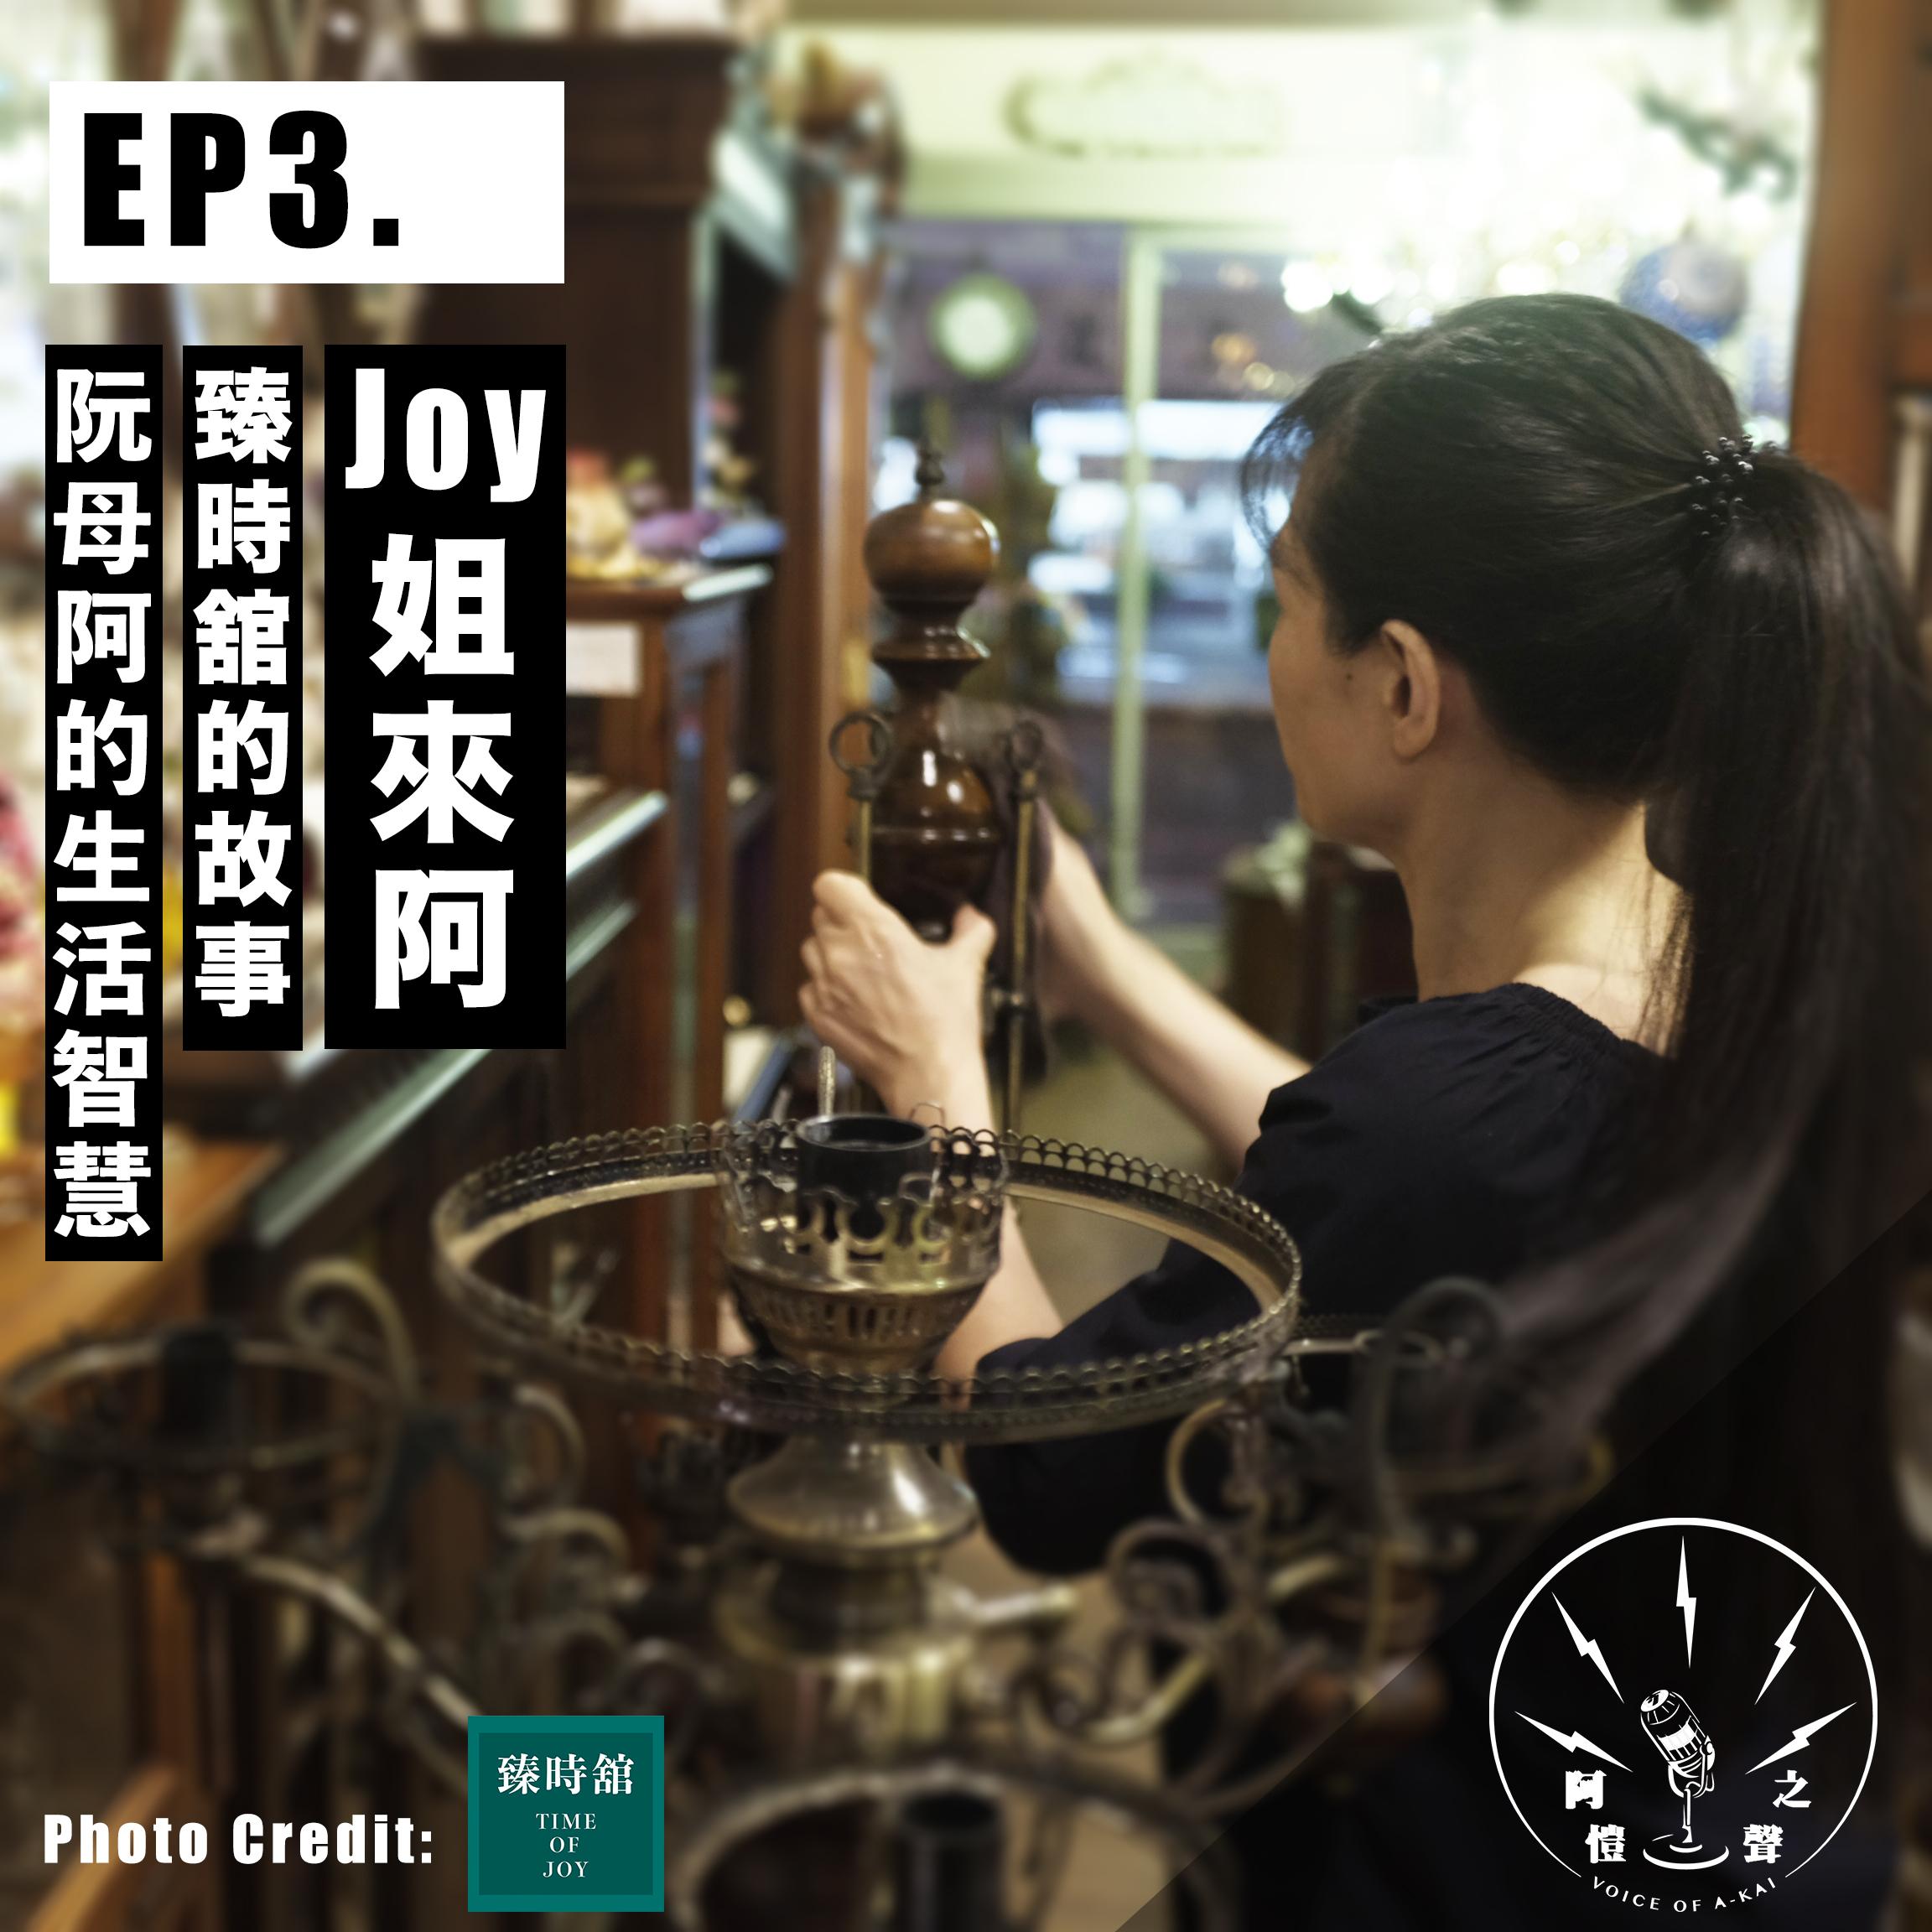 EP3 Joy姊來阿:臻時舘的故事,阮母阿的生活智慧